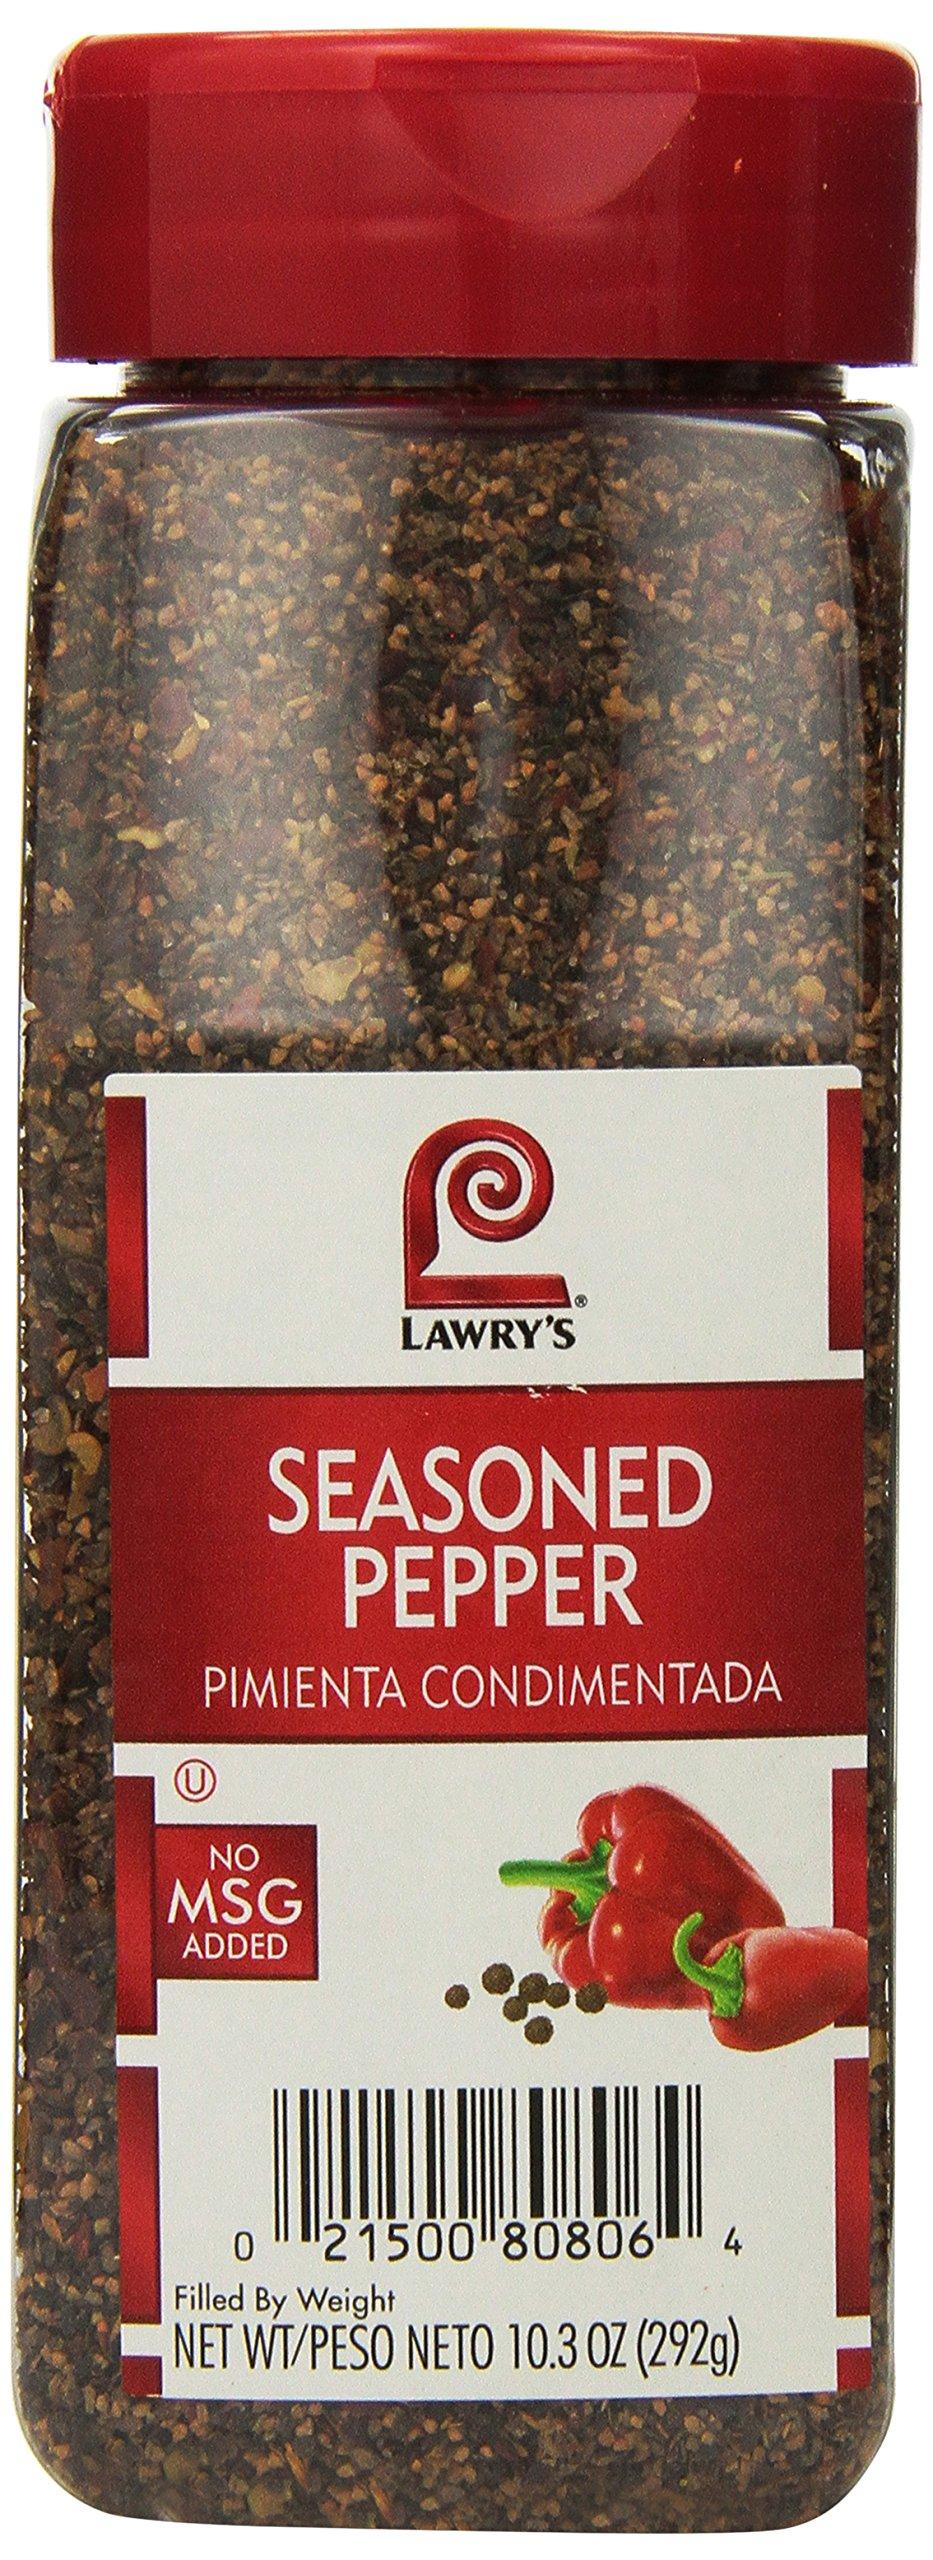 Lawrys Seasoned Pepper - 10.3 oz. container, 6 per case